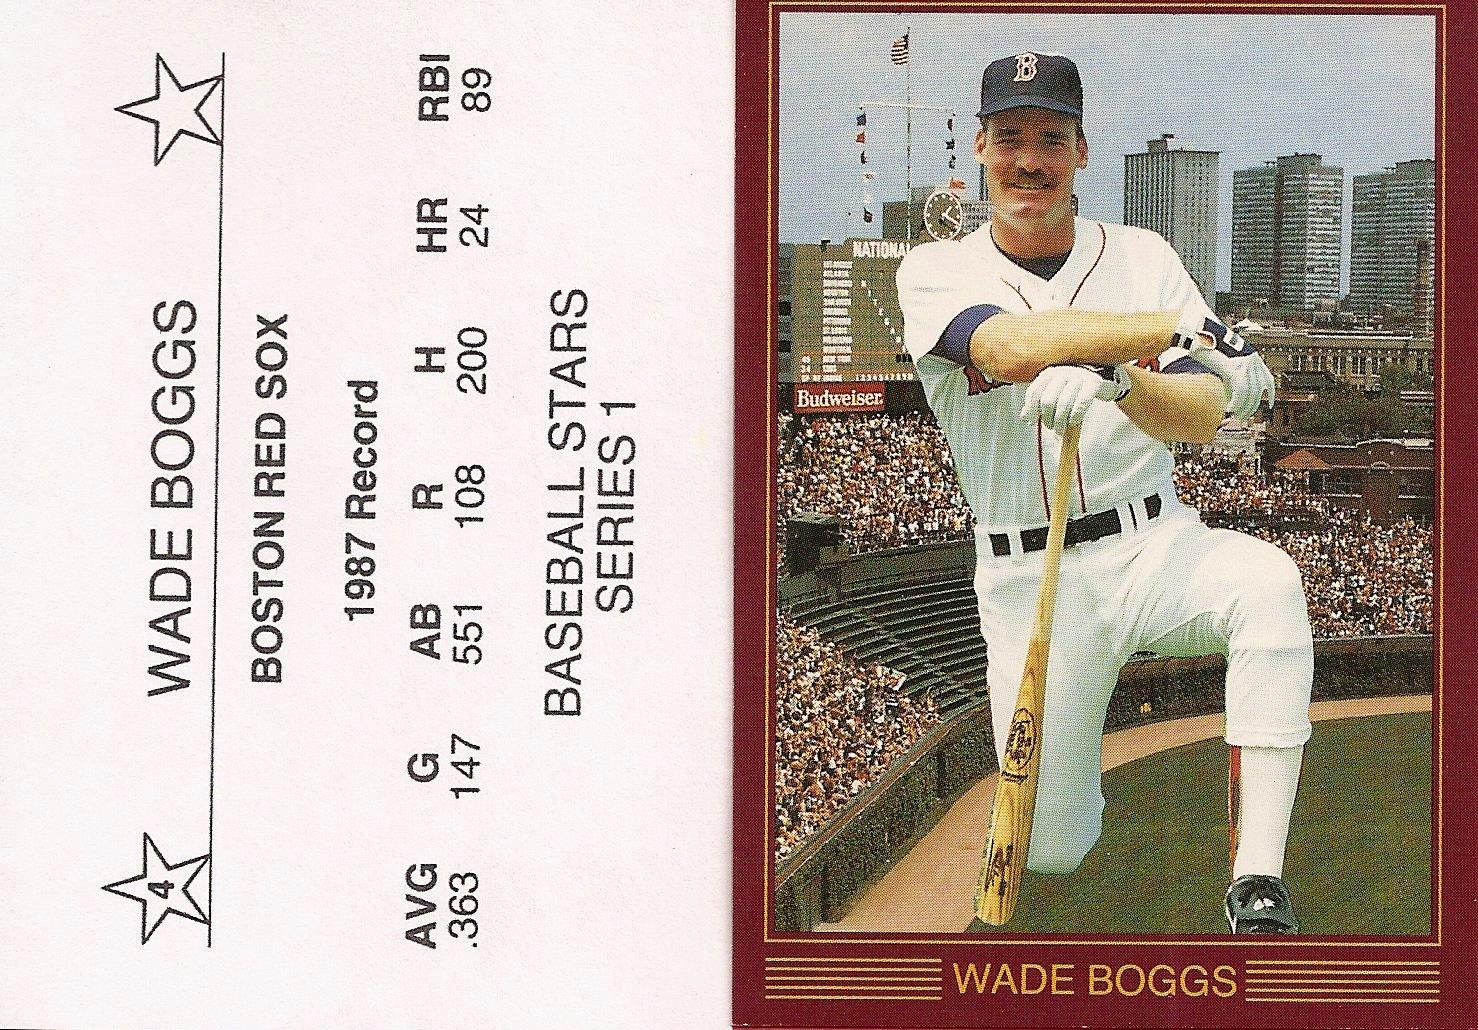 1988 Baseball Stars Series 1